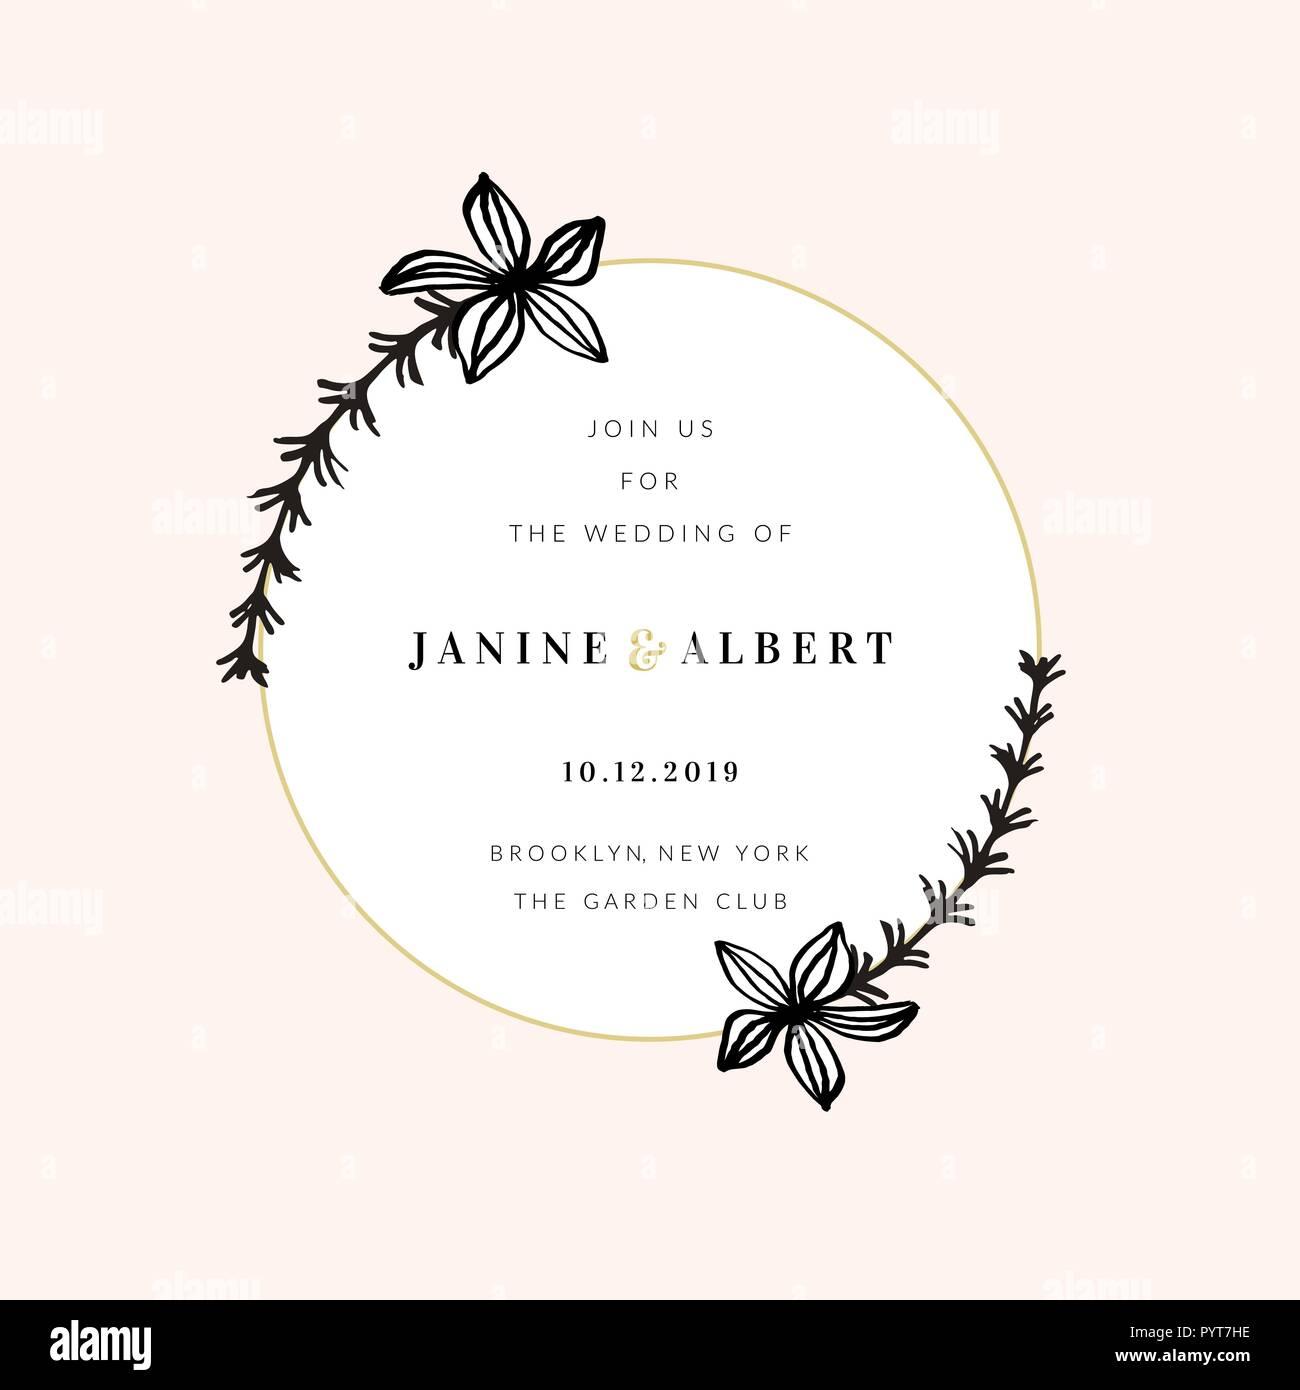 Wedding Invitation Design Template With Golden Round Frame Floral